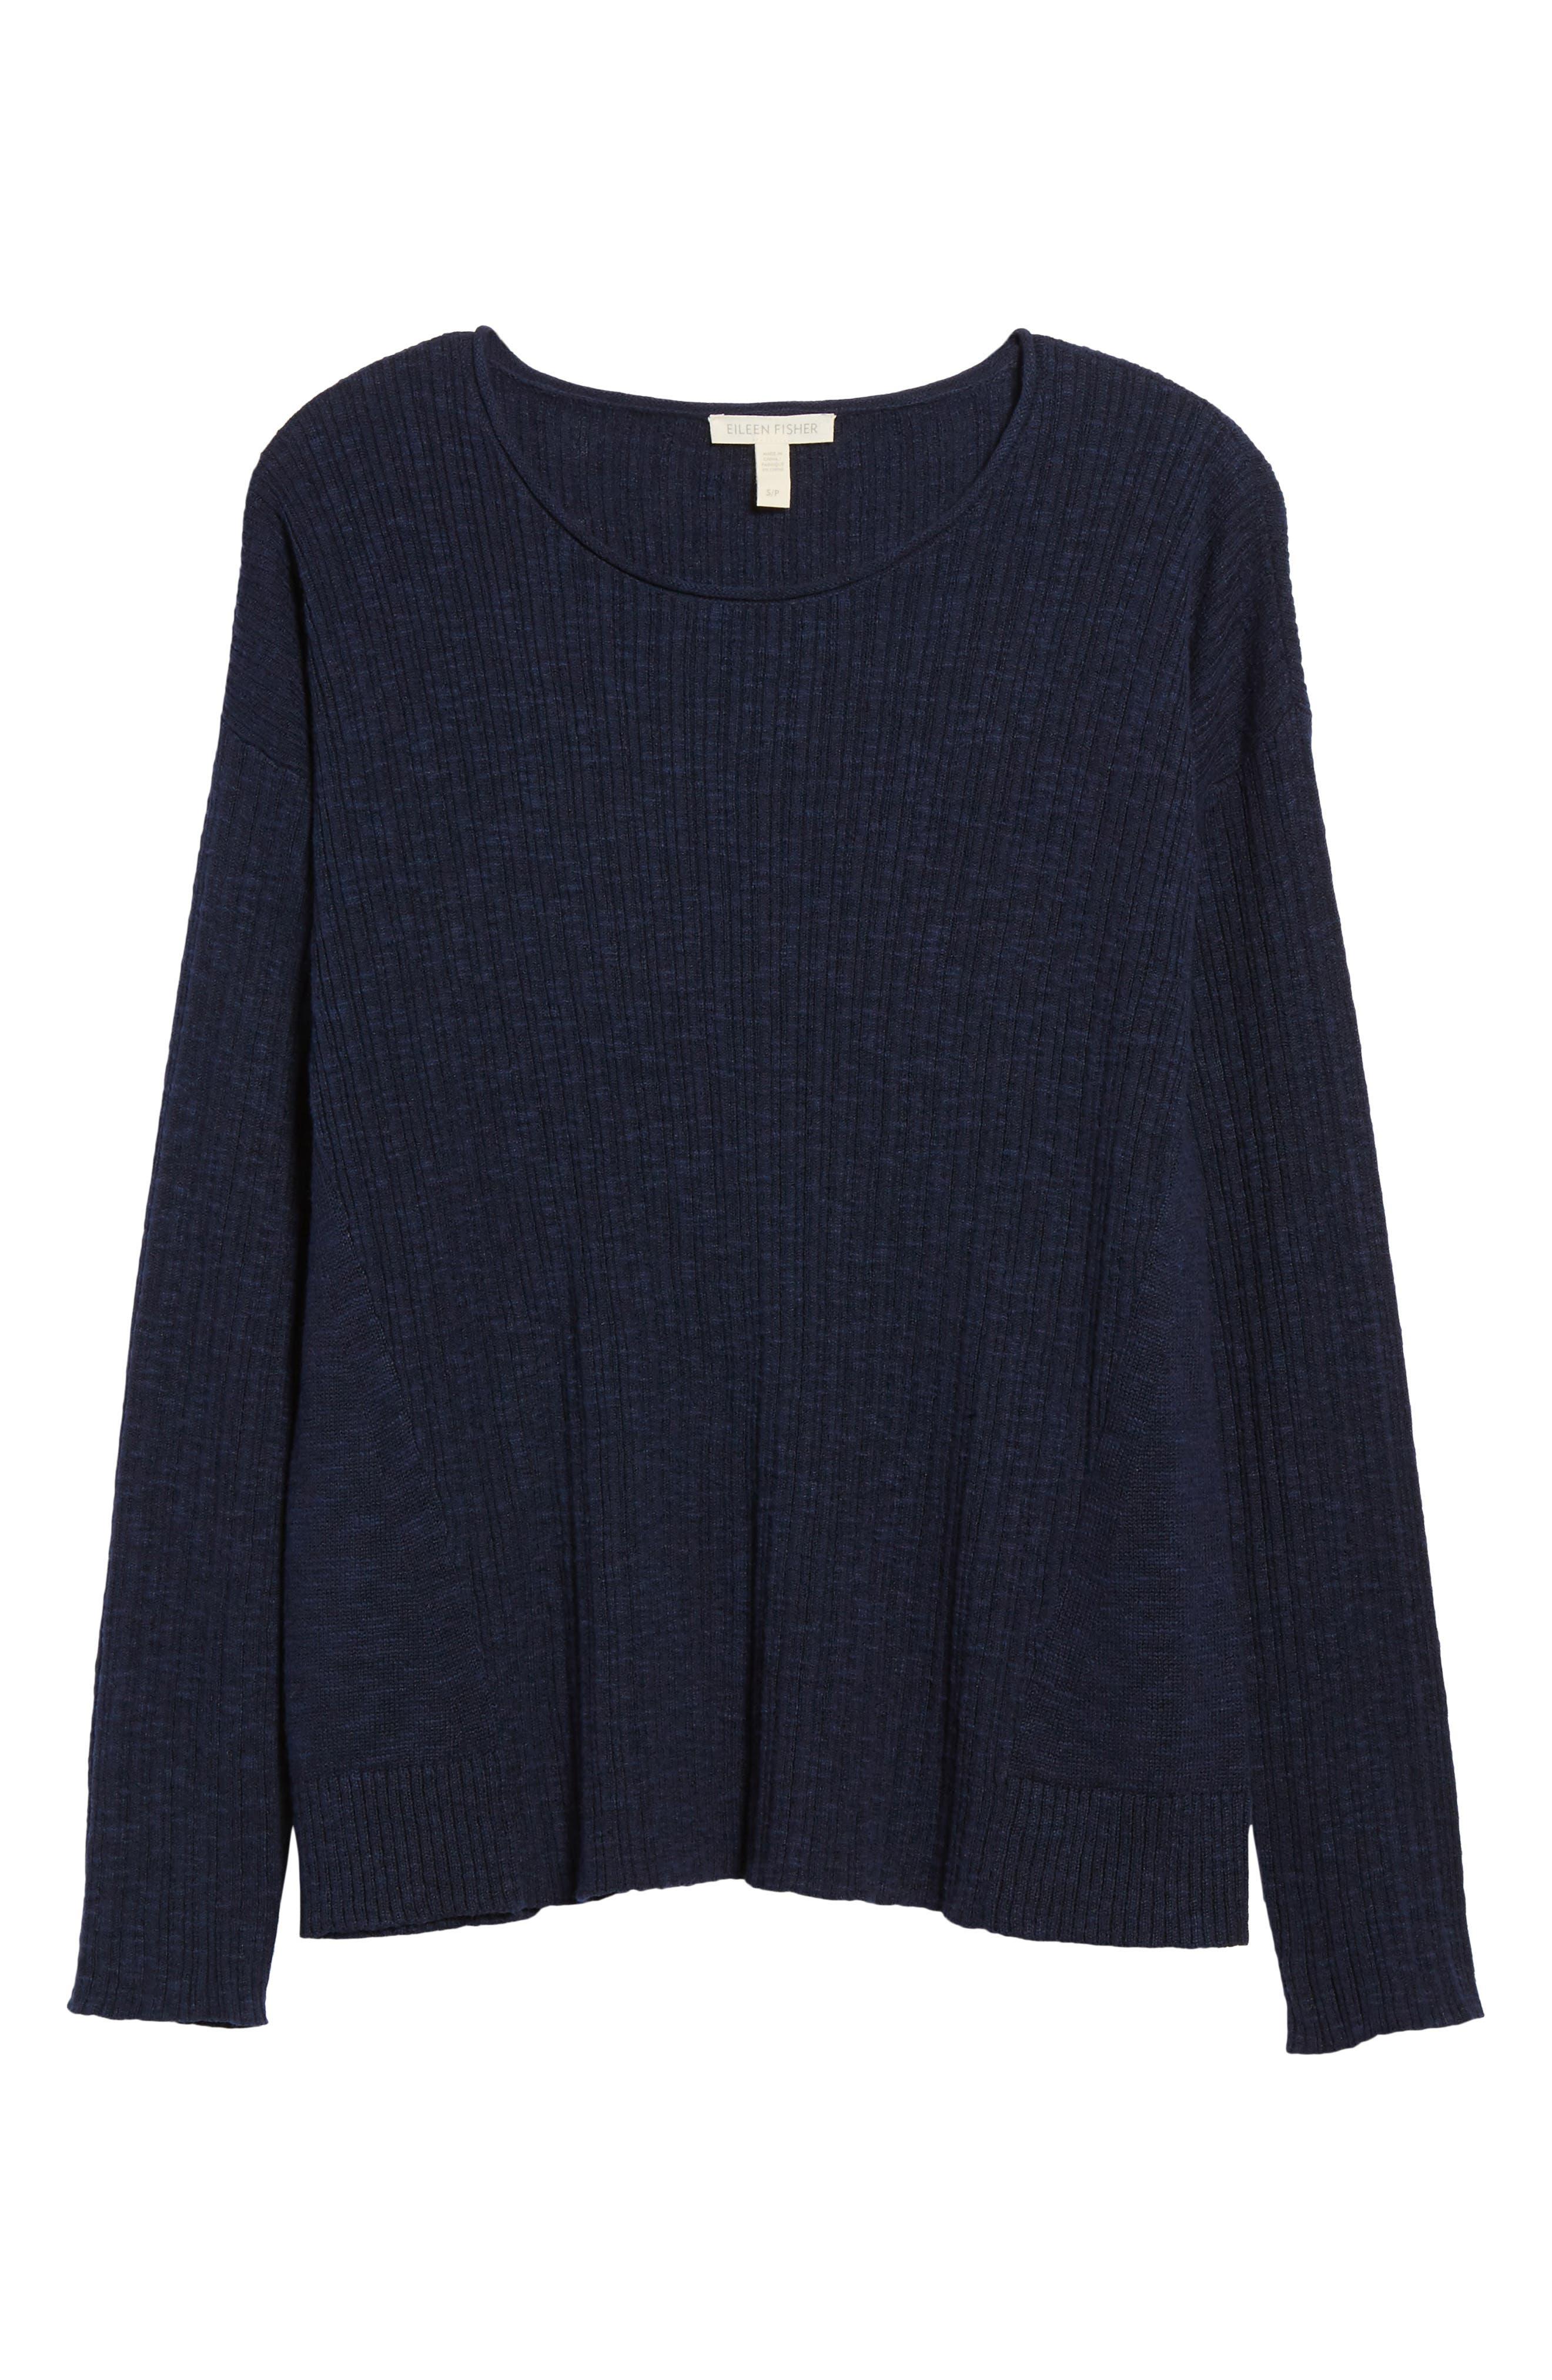 Organic Linen & Cotton Crewneck Sweater,                             Alternate thumbnail 30, color,